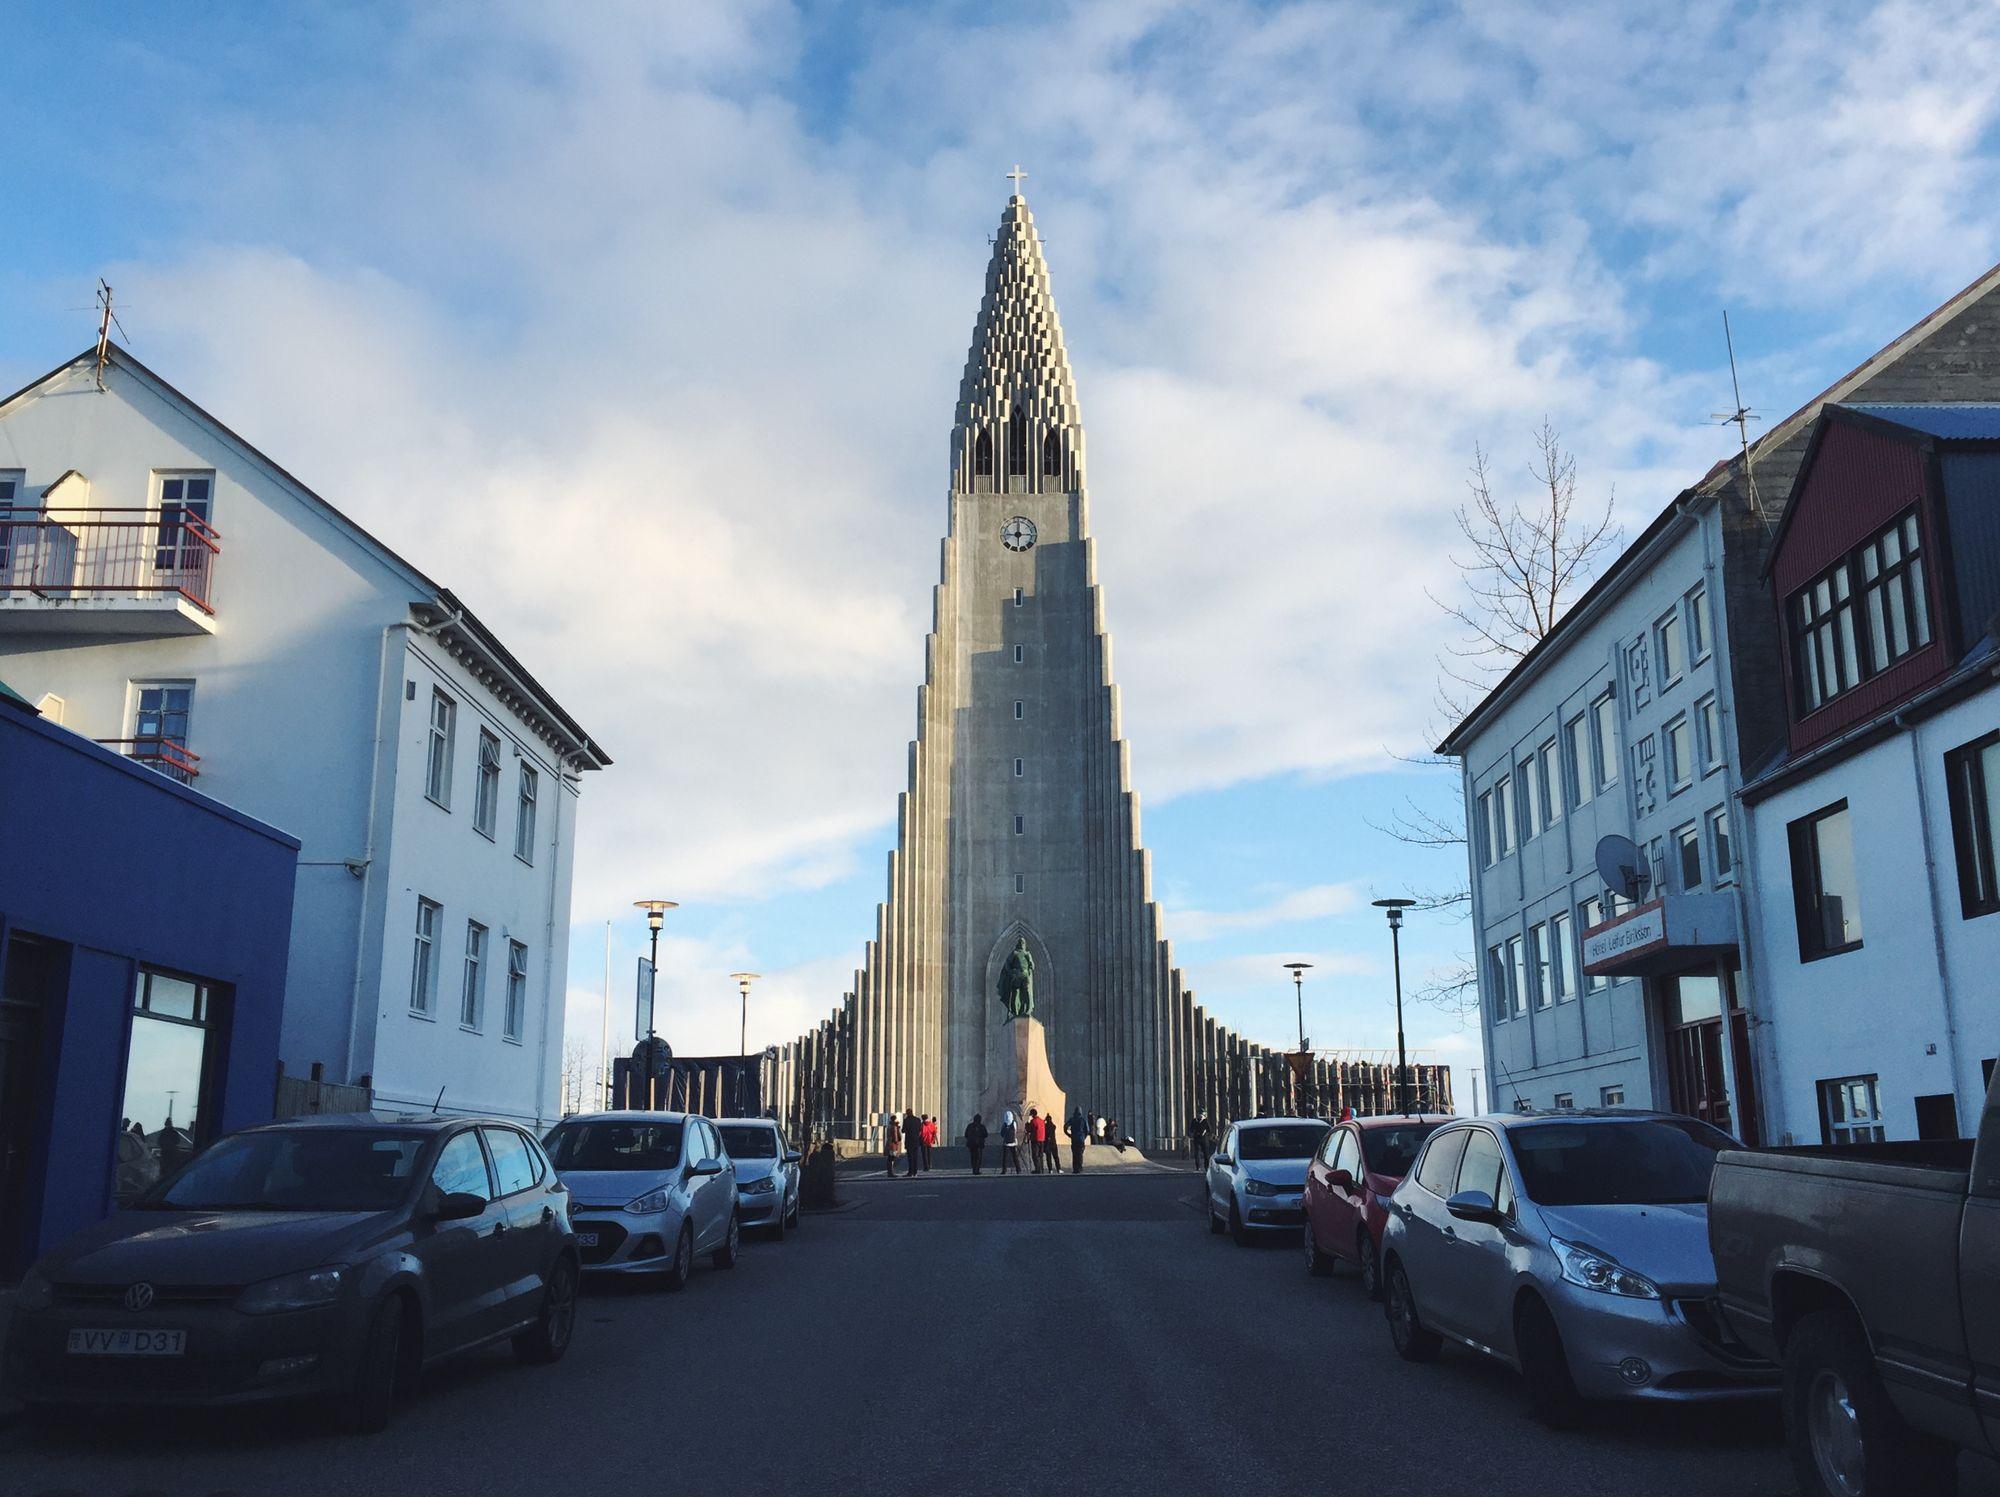 Hallgrímskirkja Cathedral in Rejkavik, Iceland.